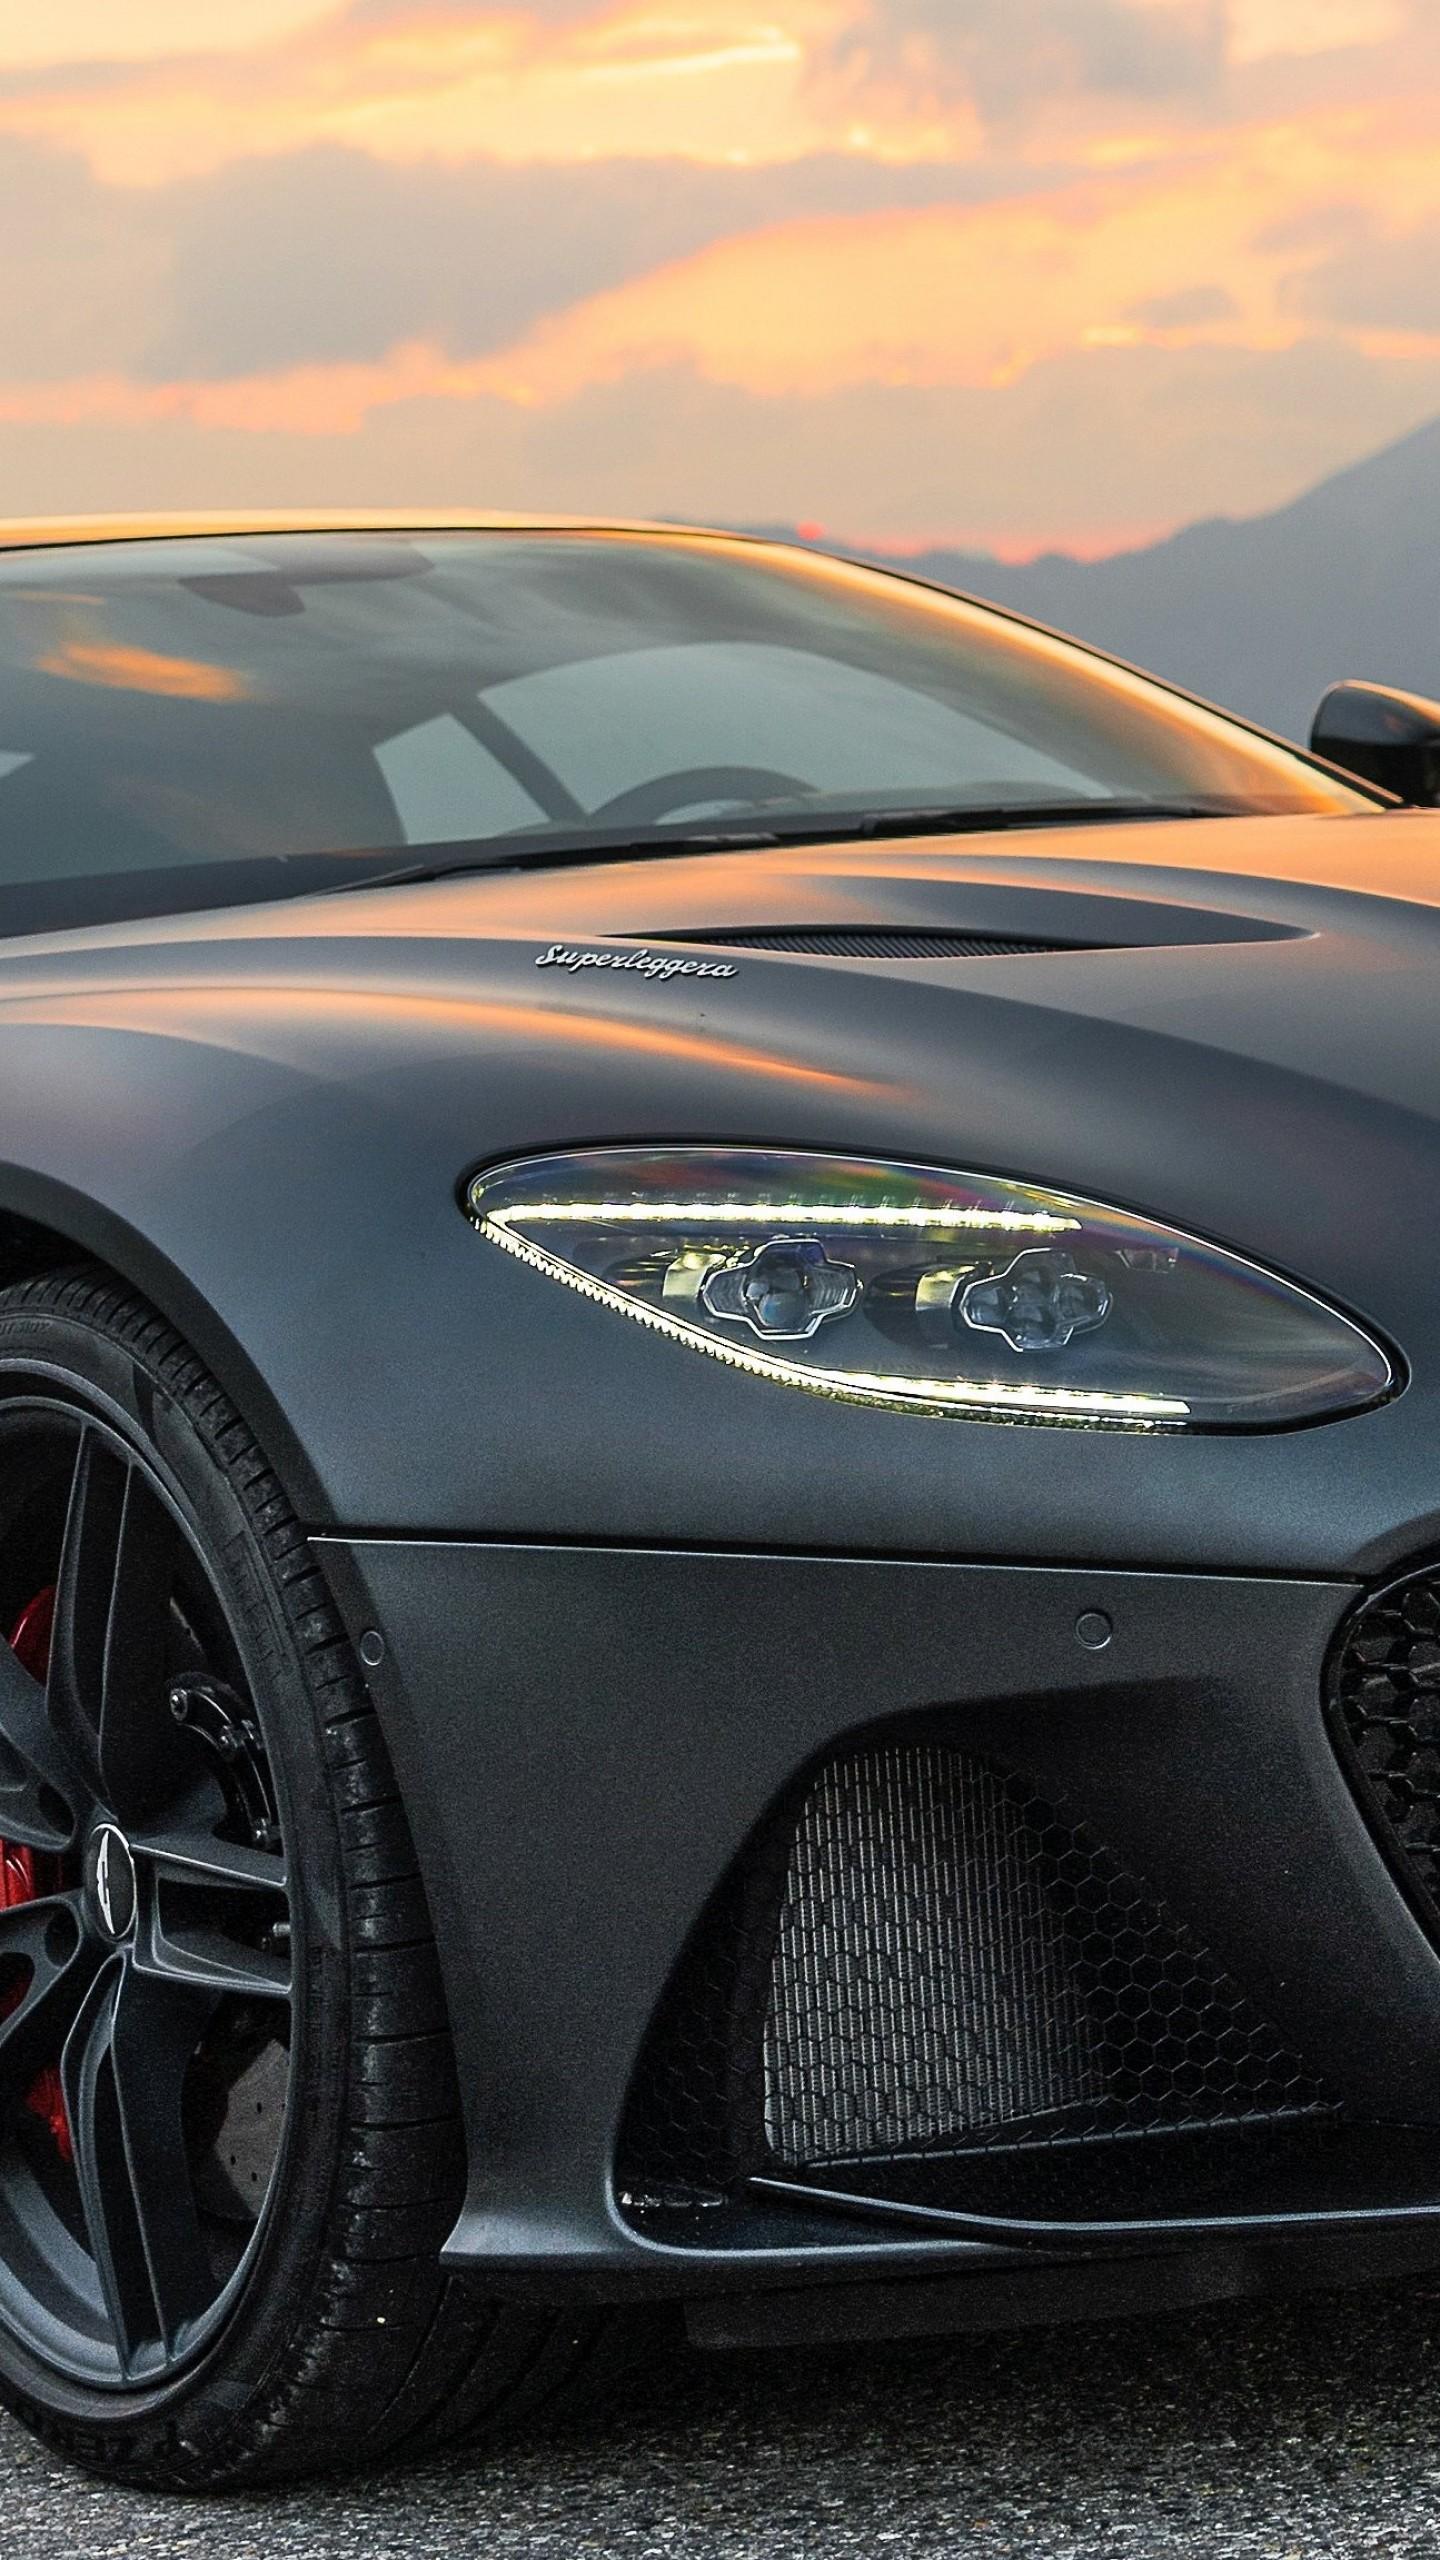 Wallpaper Aston Martin DBS Superleggera, 2019 Cars, 4K, Cars & Bikes